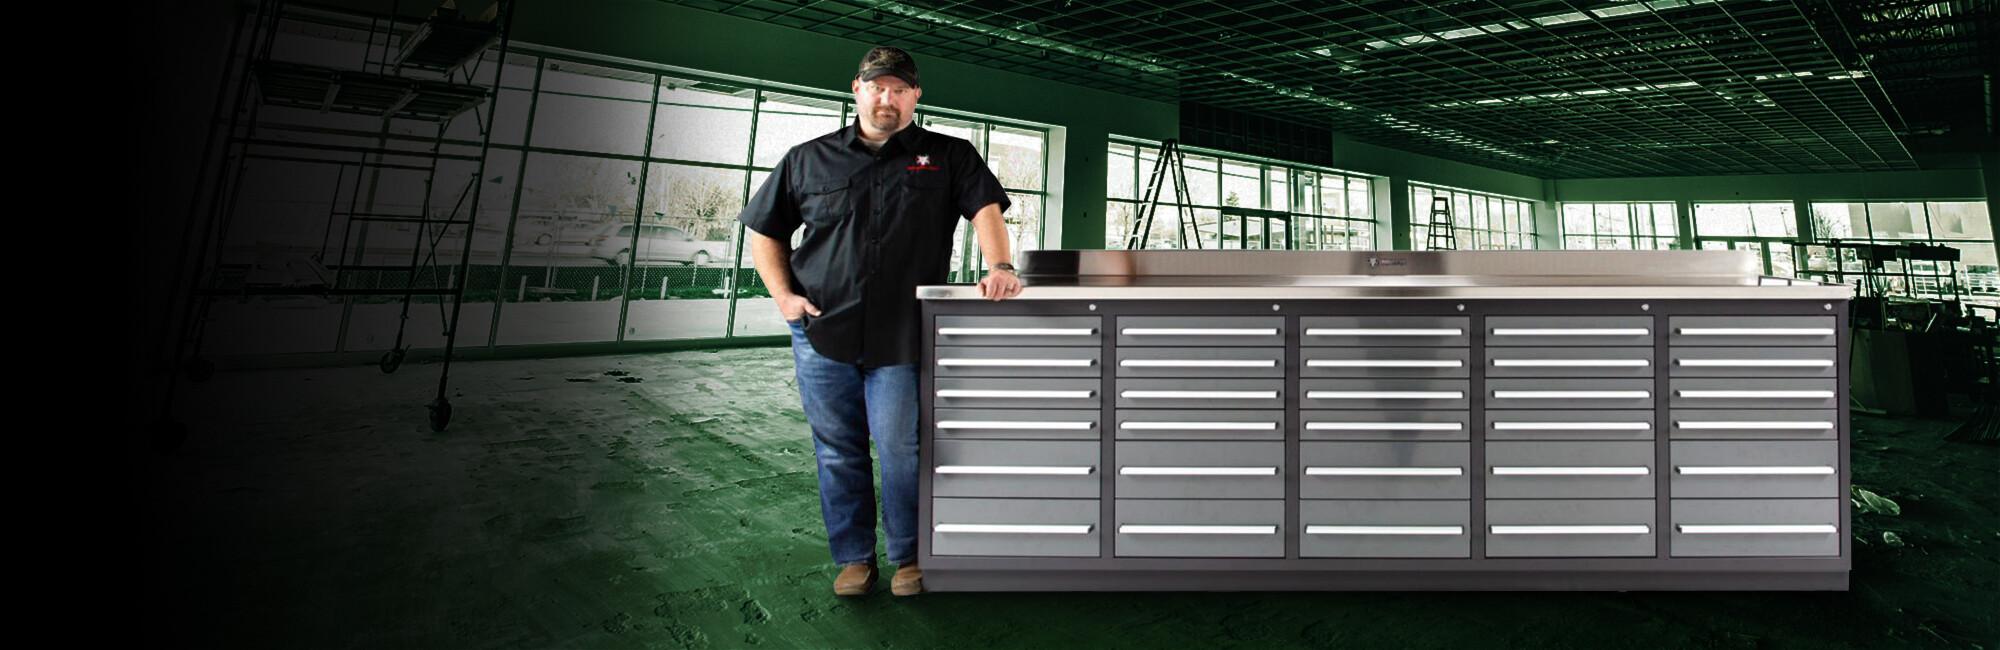 Incredible Heavy Duty Industrial All Steel Workbenches With Drawers Inzonedesignstudio Interior Chair Design Inzonedesignstudiocom